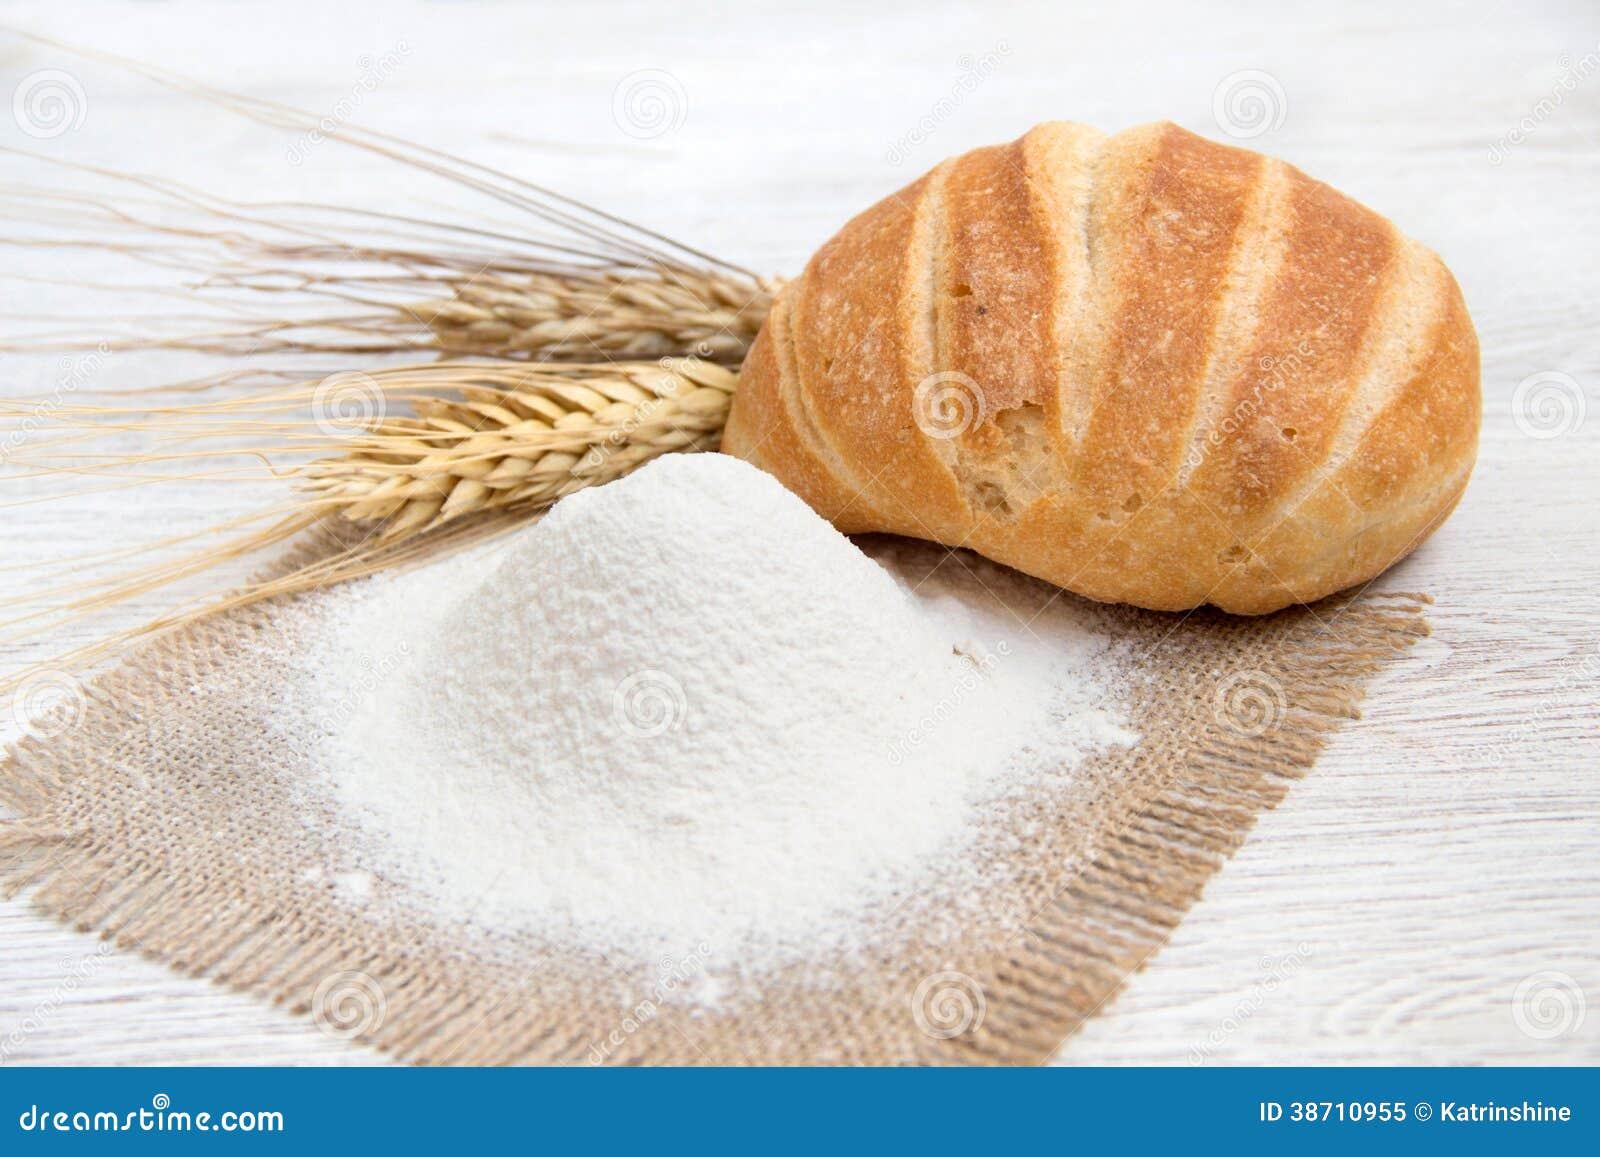 Wheat flour business plan